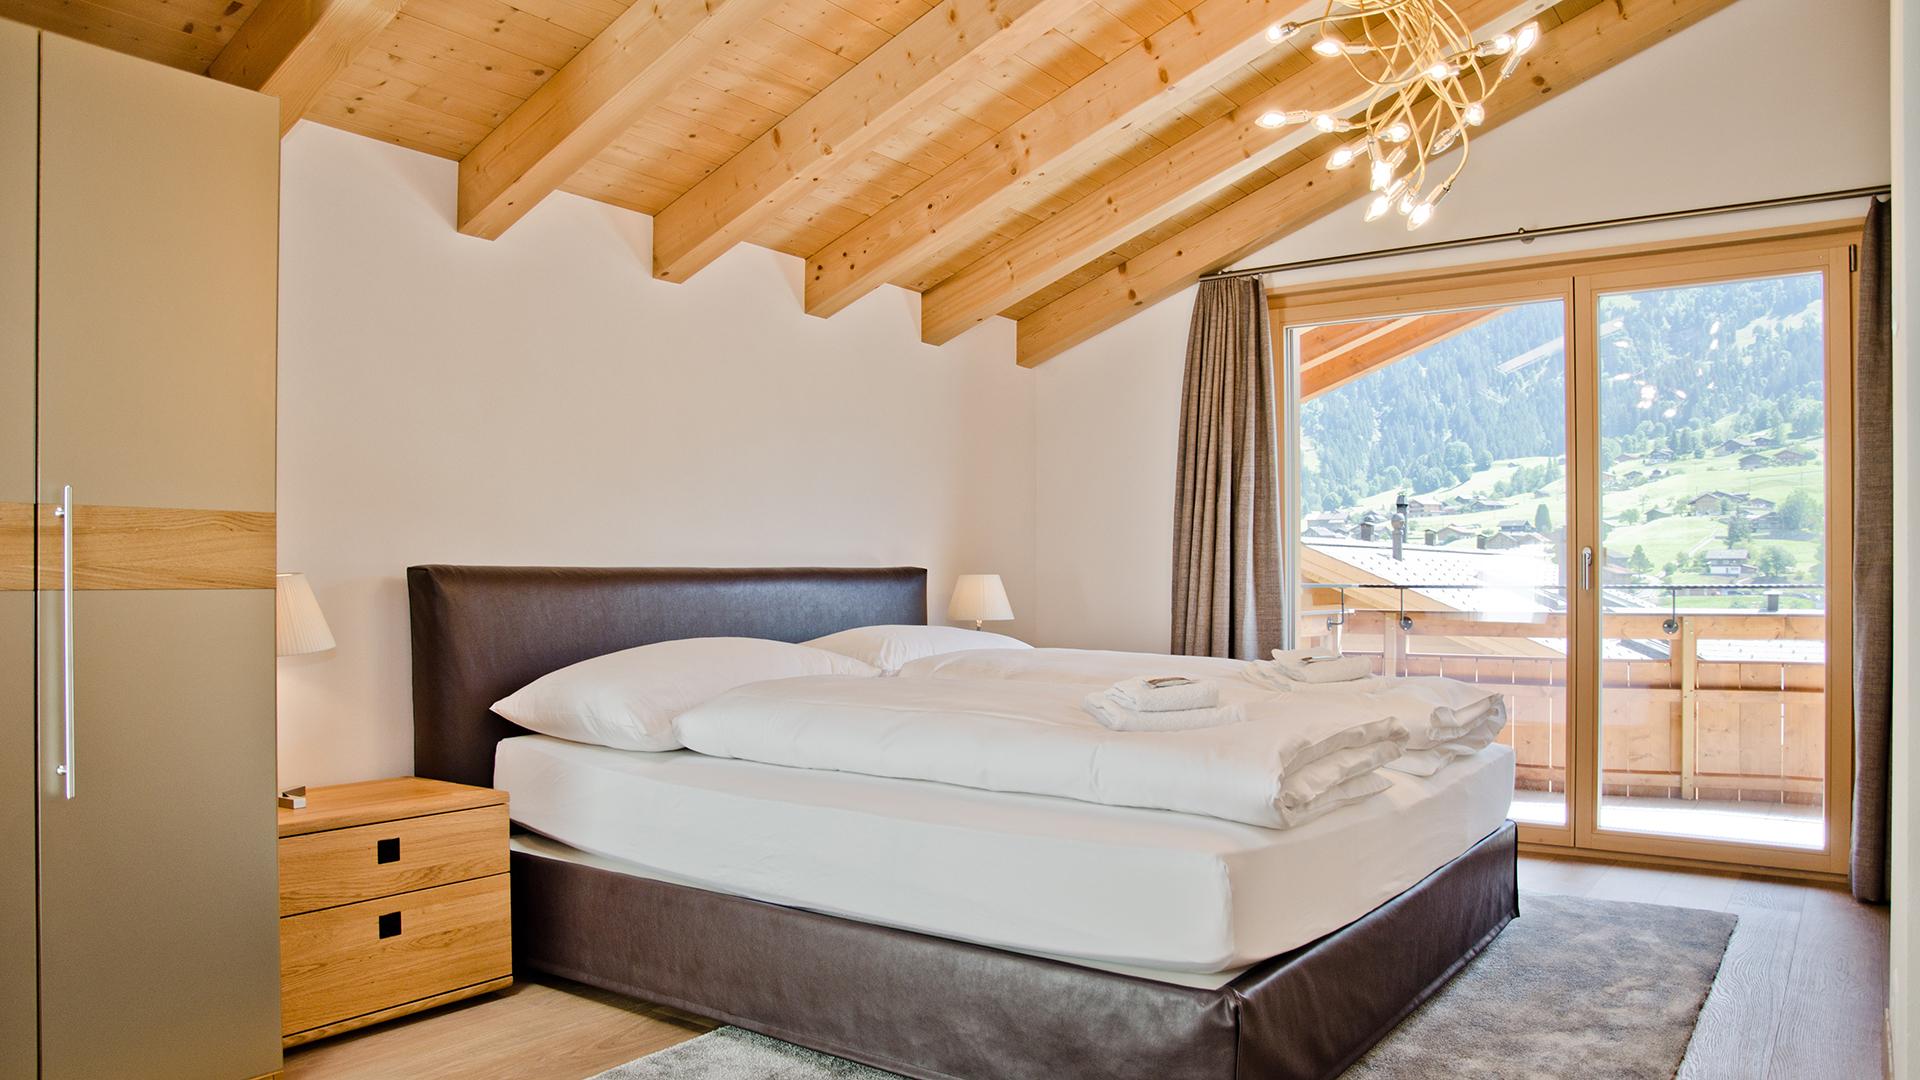 Chalet Rothernegg Chalet, Switzerland